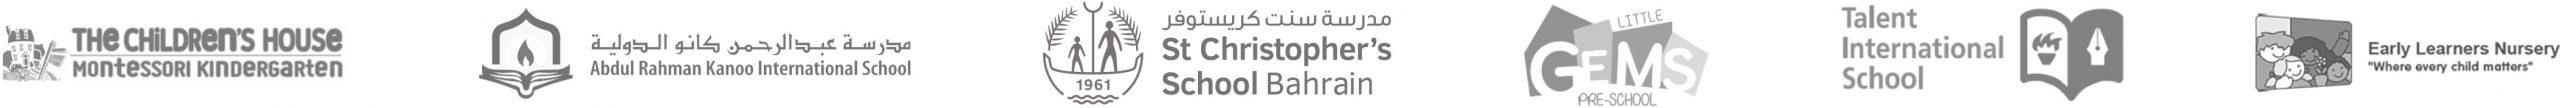 school-logos-5